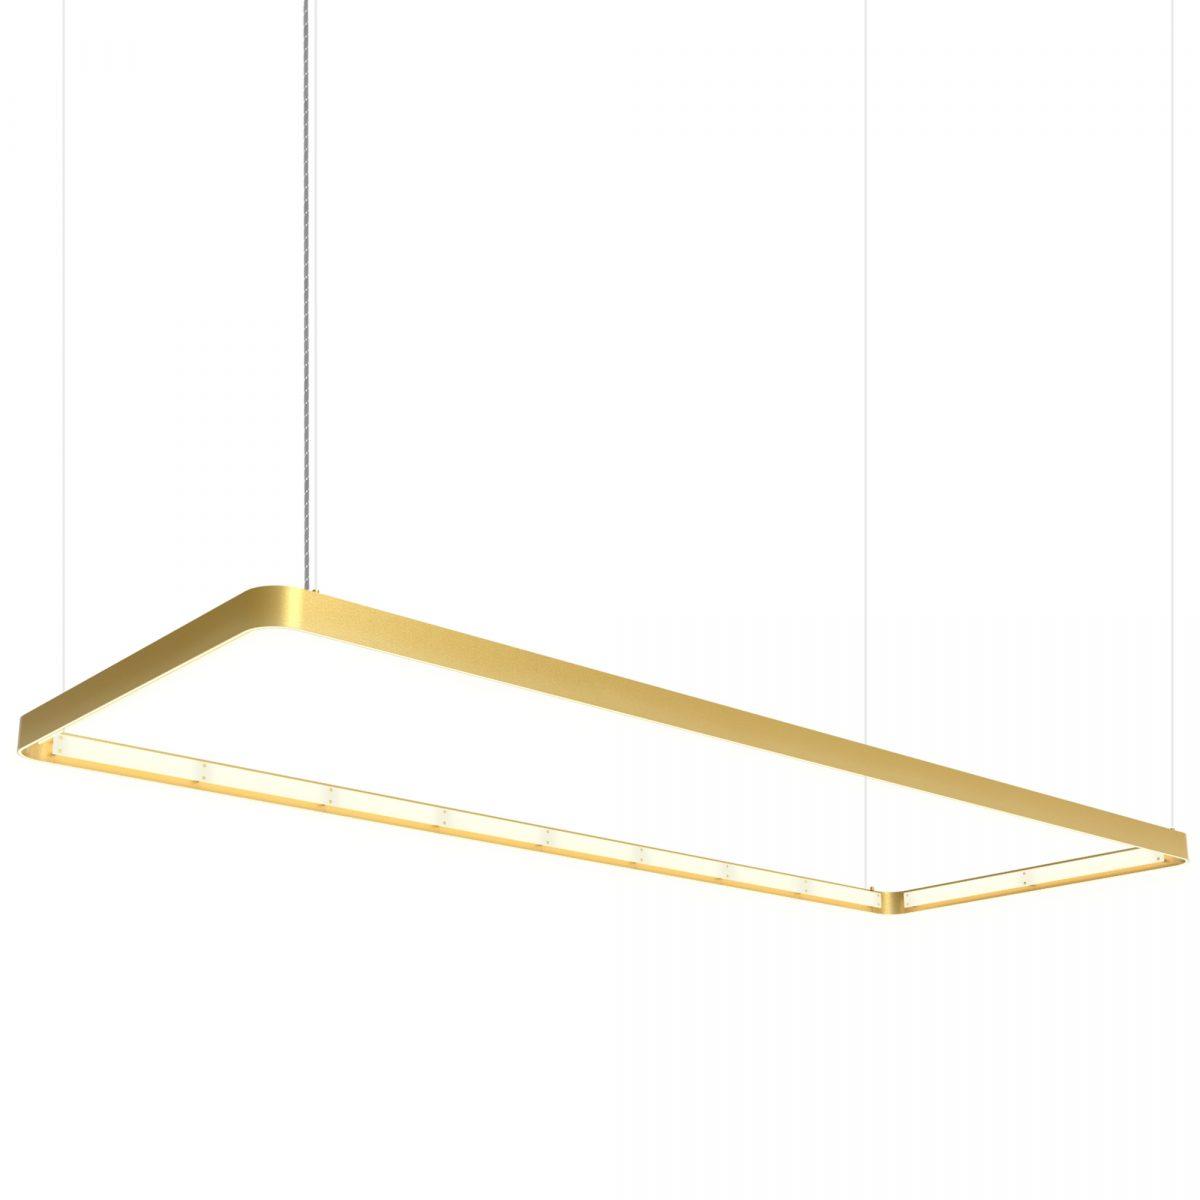 JSPR Eden Deco 75×200 Gold Rectangle